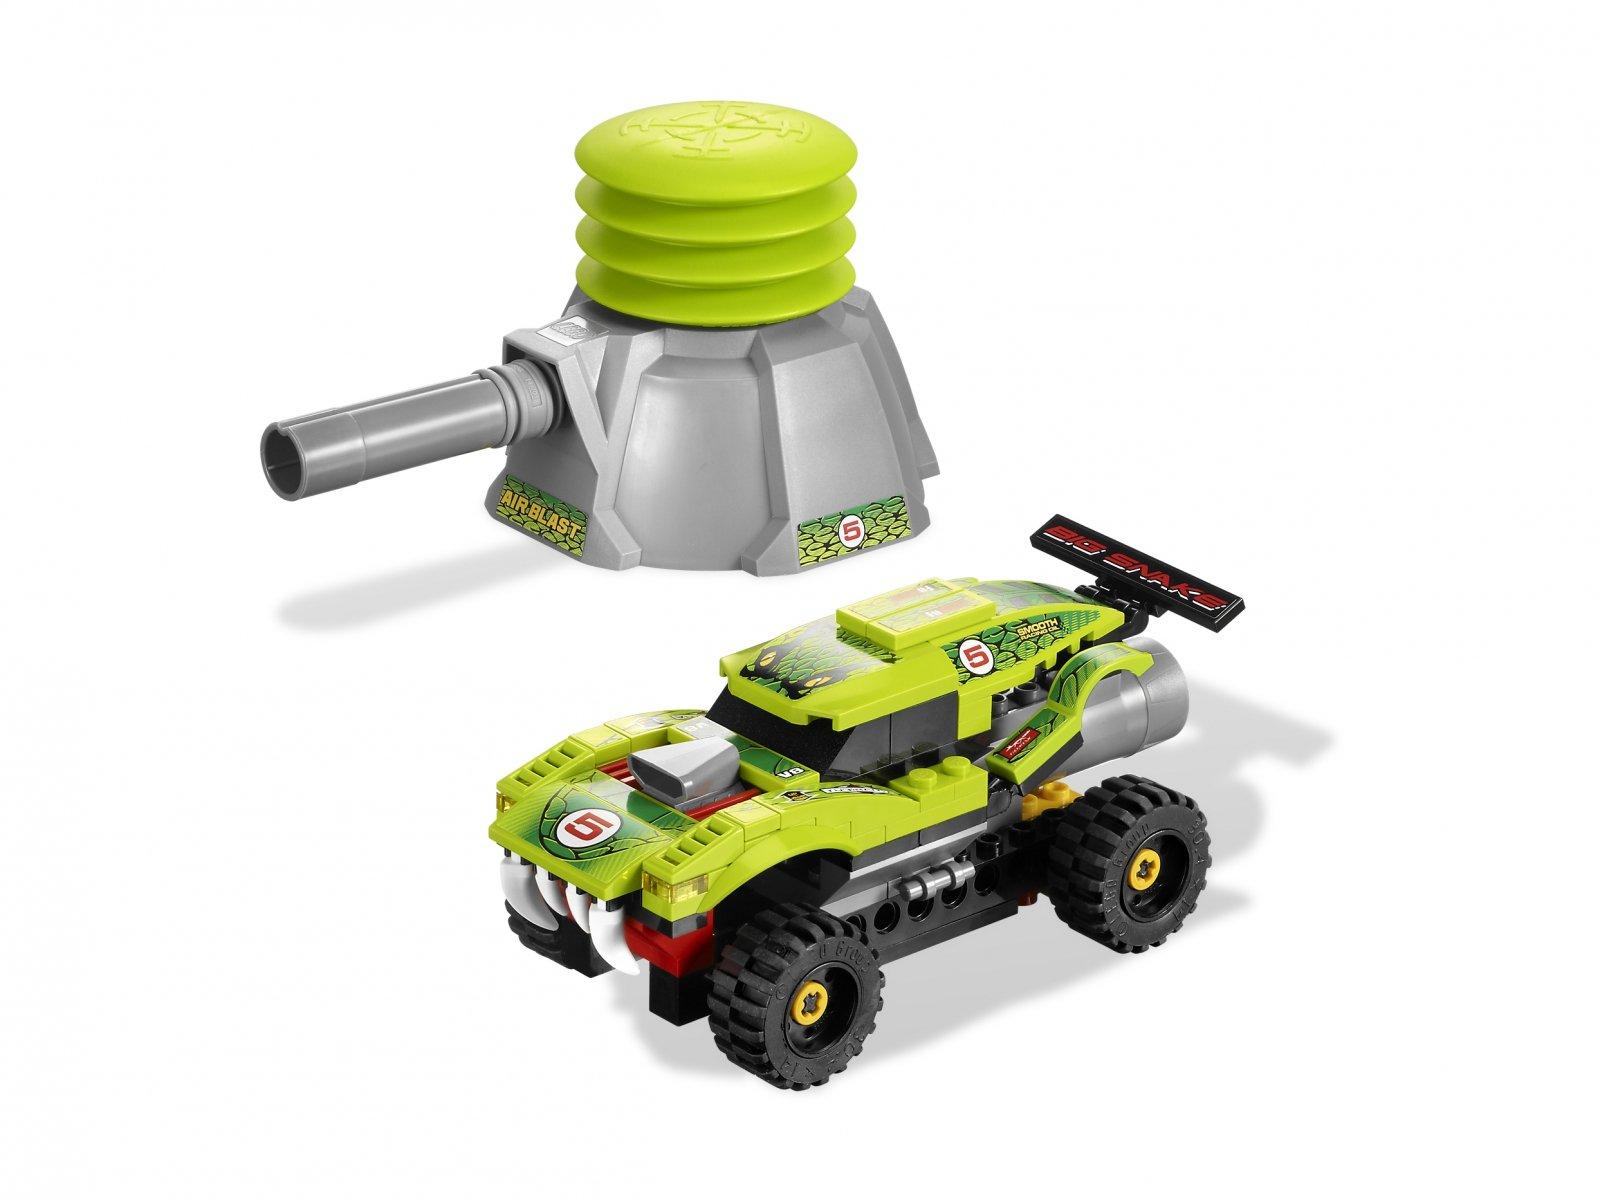 LEGO 8231 Racers Groźna Żmija